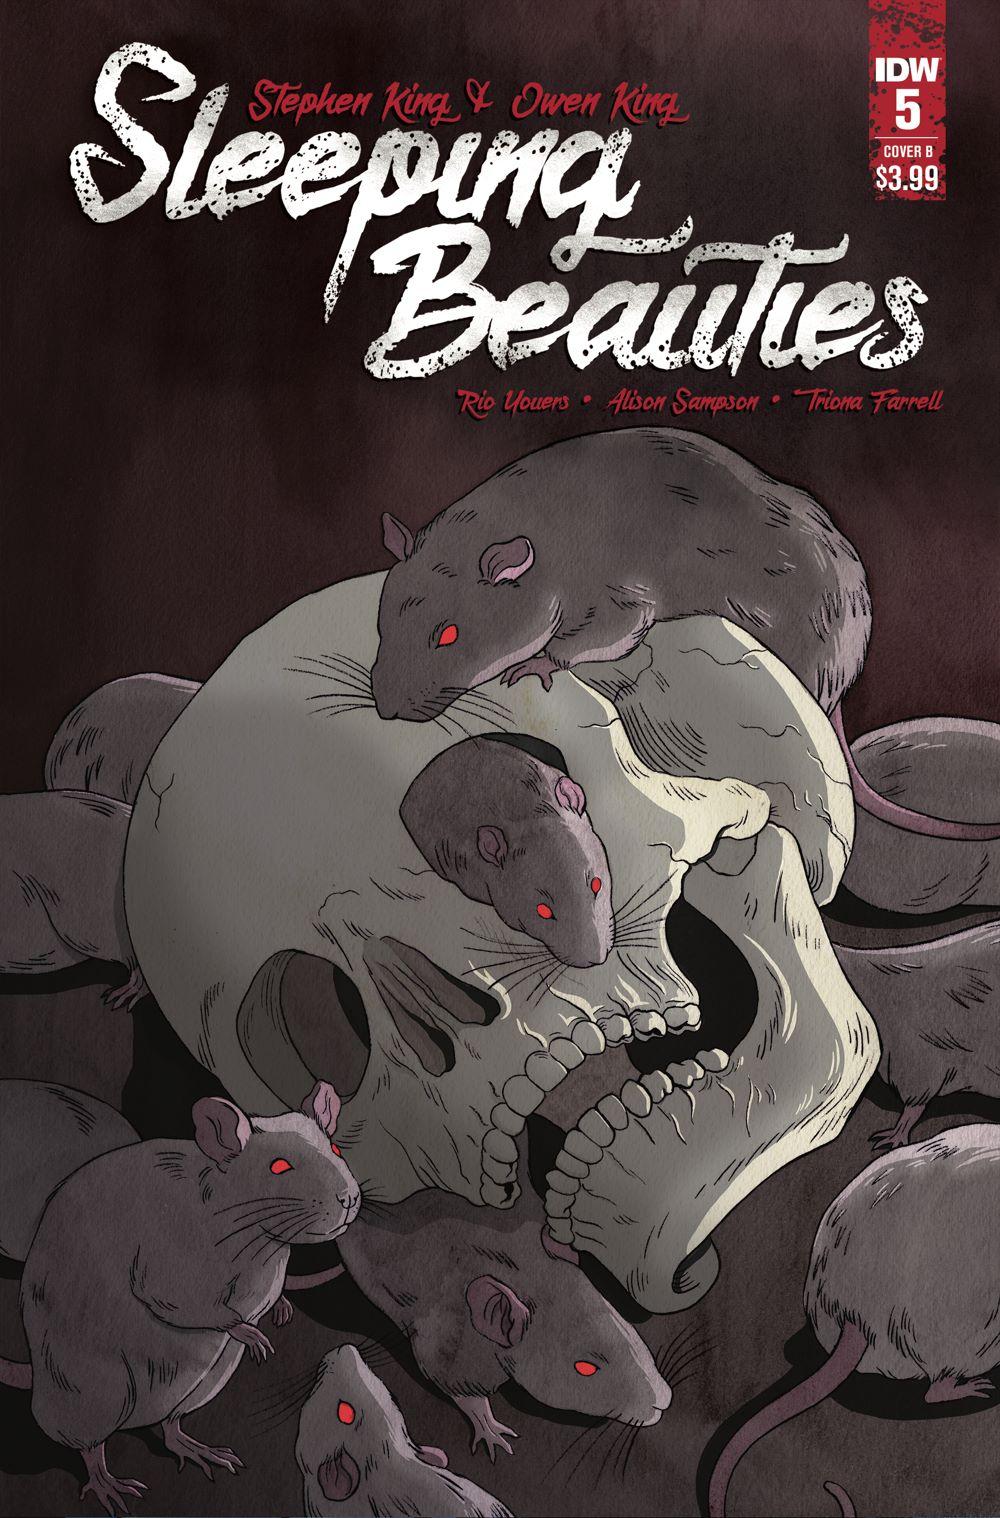 SleepingBeauties_05_CVR_B ComicList: IDW Publishing New Releases for 01/06/2021